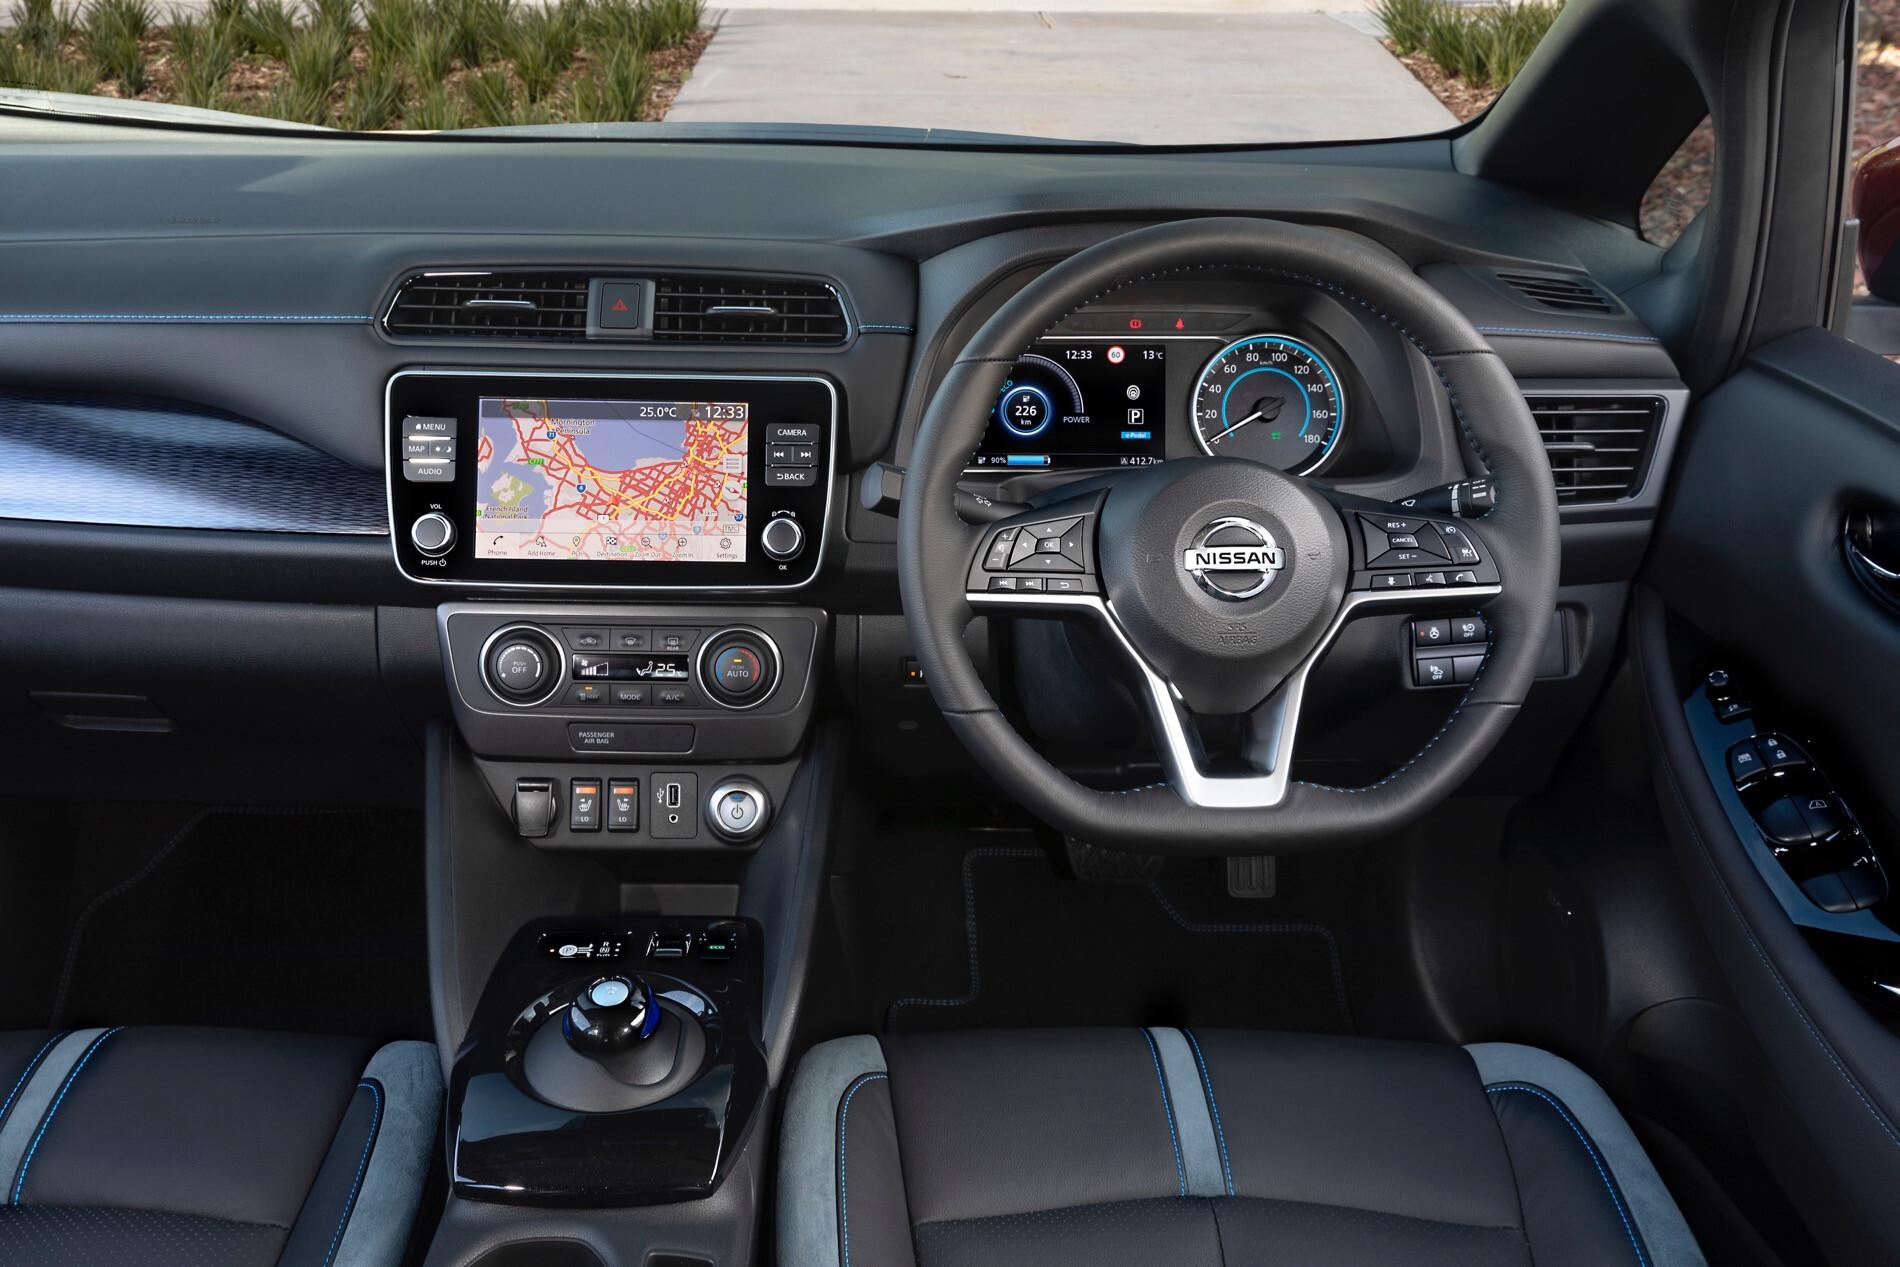 Nissan LEAF Interior 281 29 Jpg